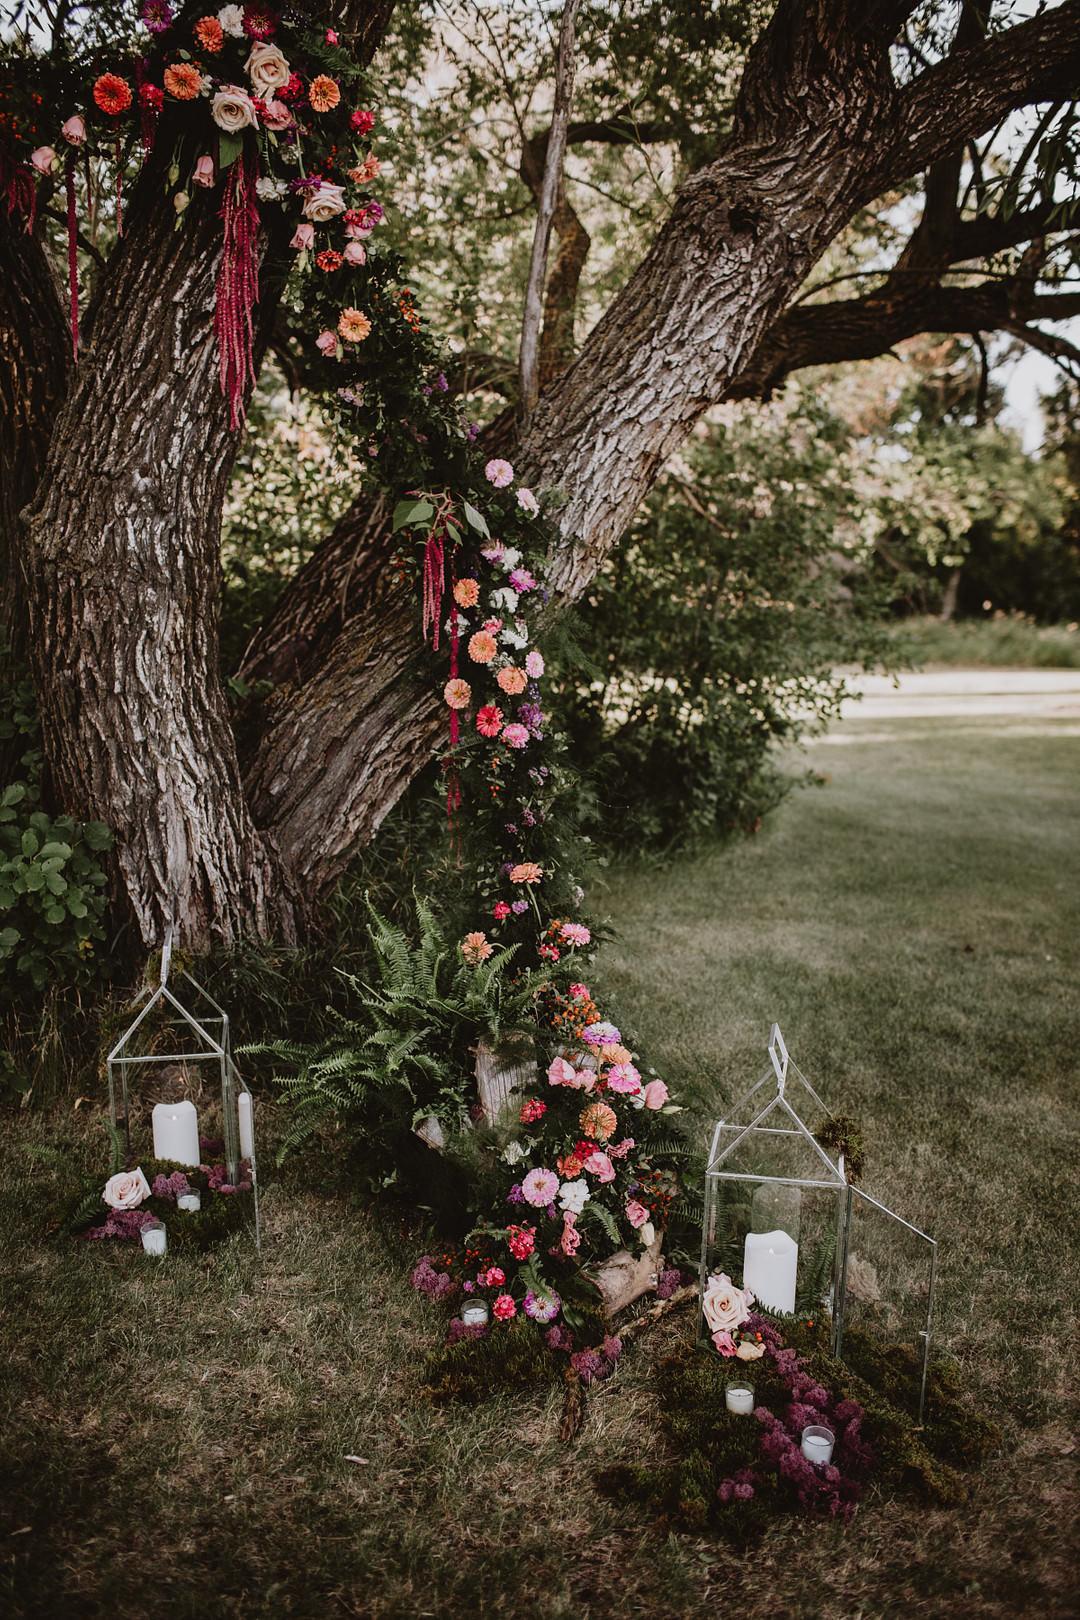 Flower Installation Floral Tree Candle Decor Fairytale Forest Wedding Christina W Kroeker Creative